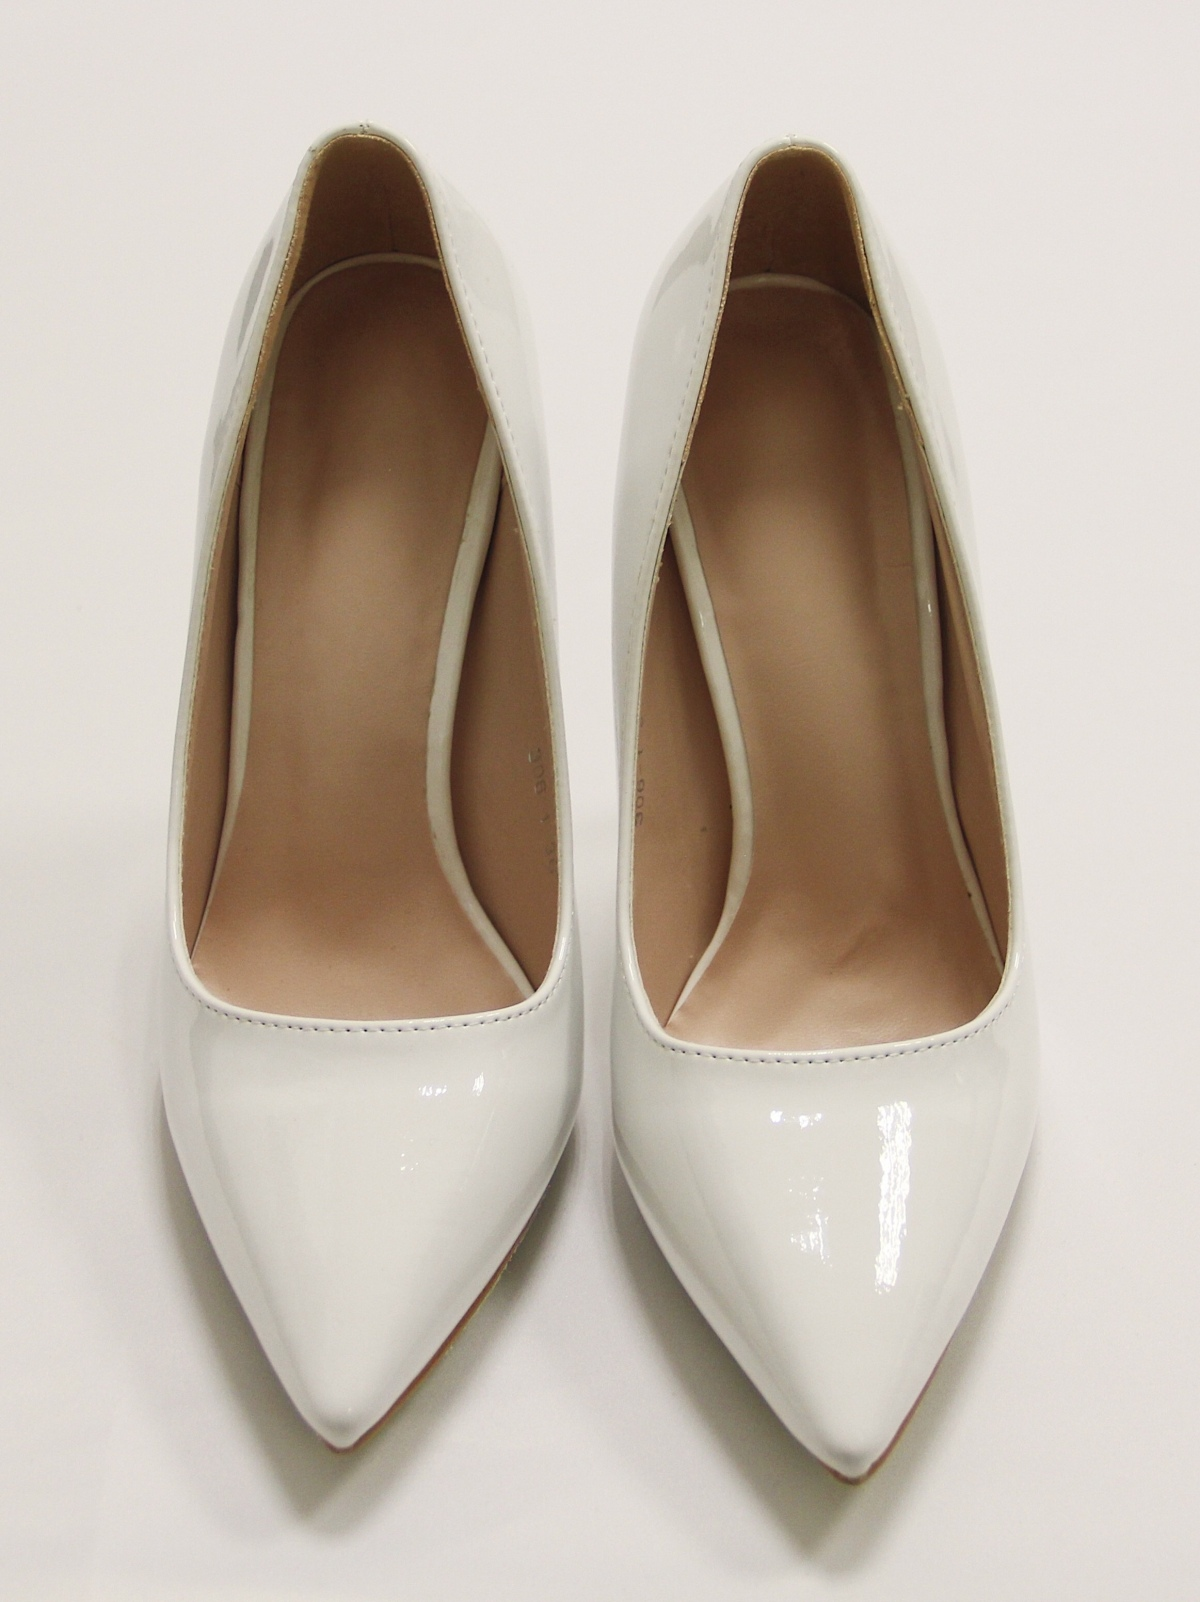 Туфли лодочки белые 2